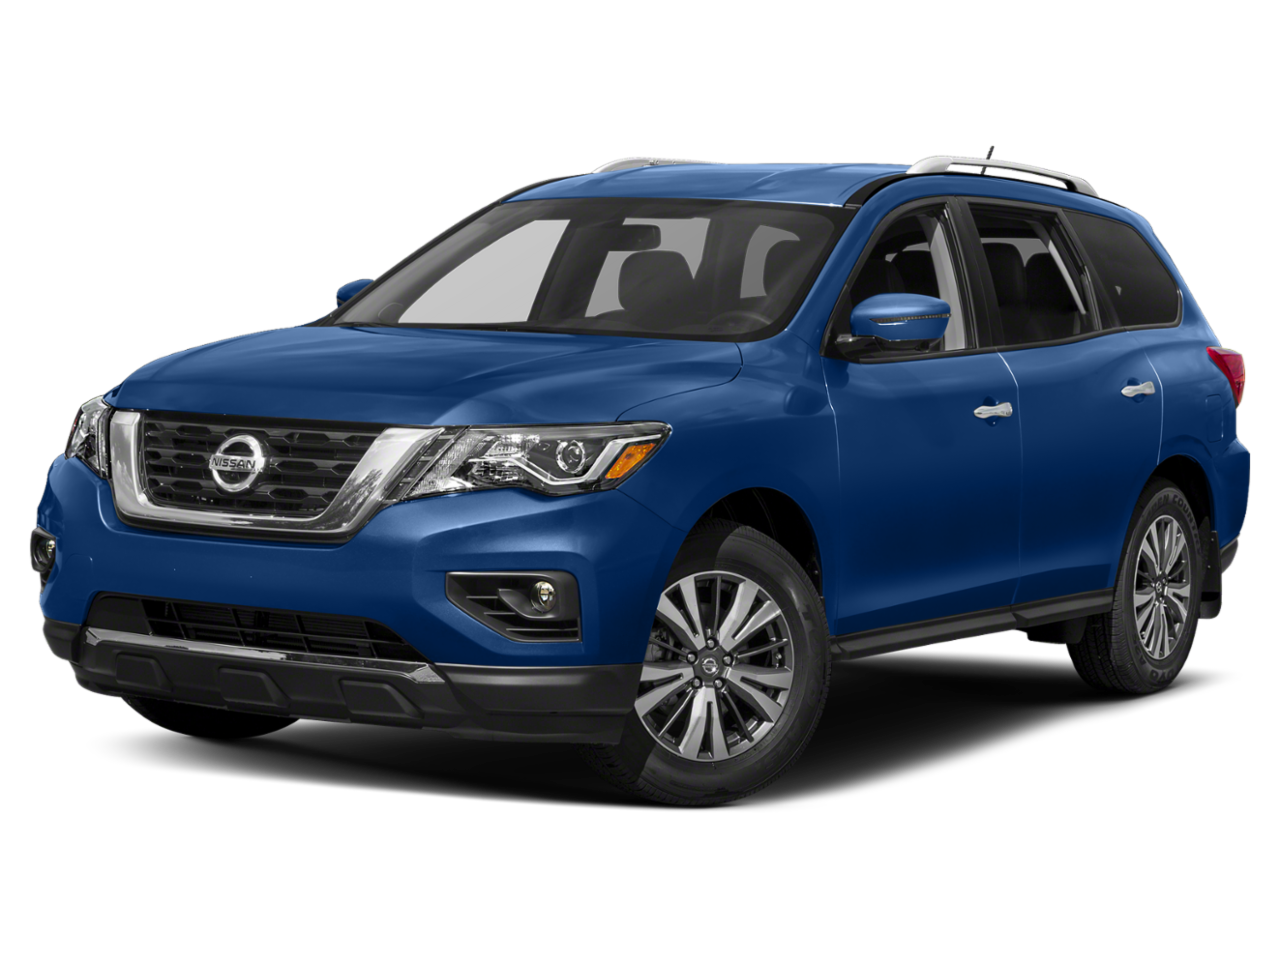 "2020 Nissan<br/><span class=""vdp-trim"">Pathfinder SL FWD Sport Utility</span>"